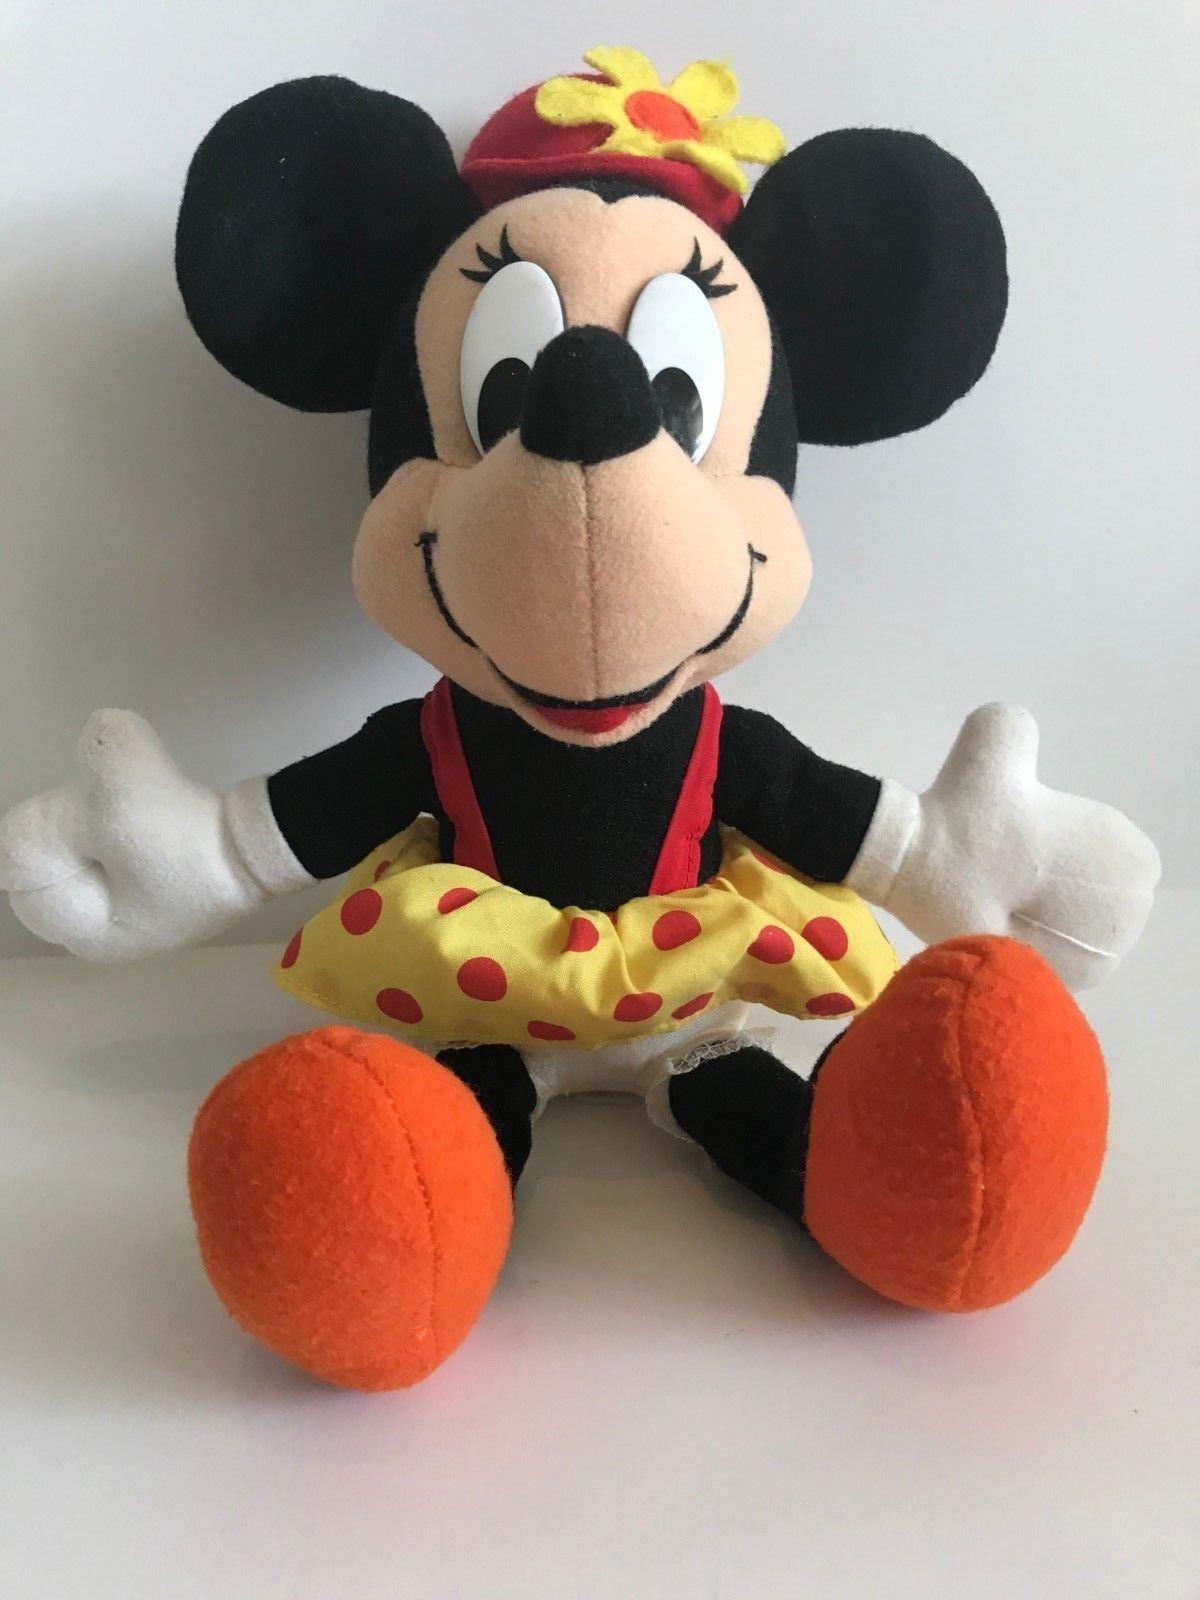 Mattel Arcotoys Minnie Mouse Yellow Red Polka Dot Flower Hat Plush Stuffed Doll image 2